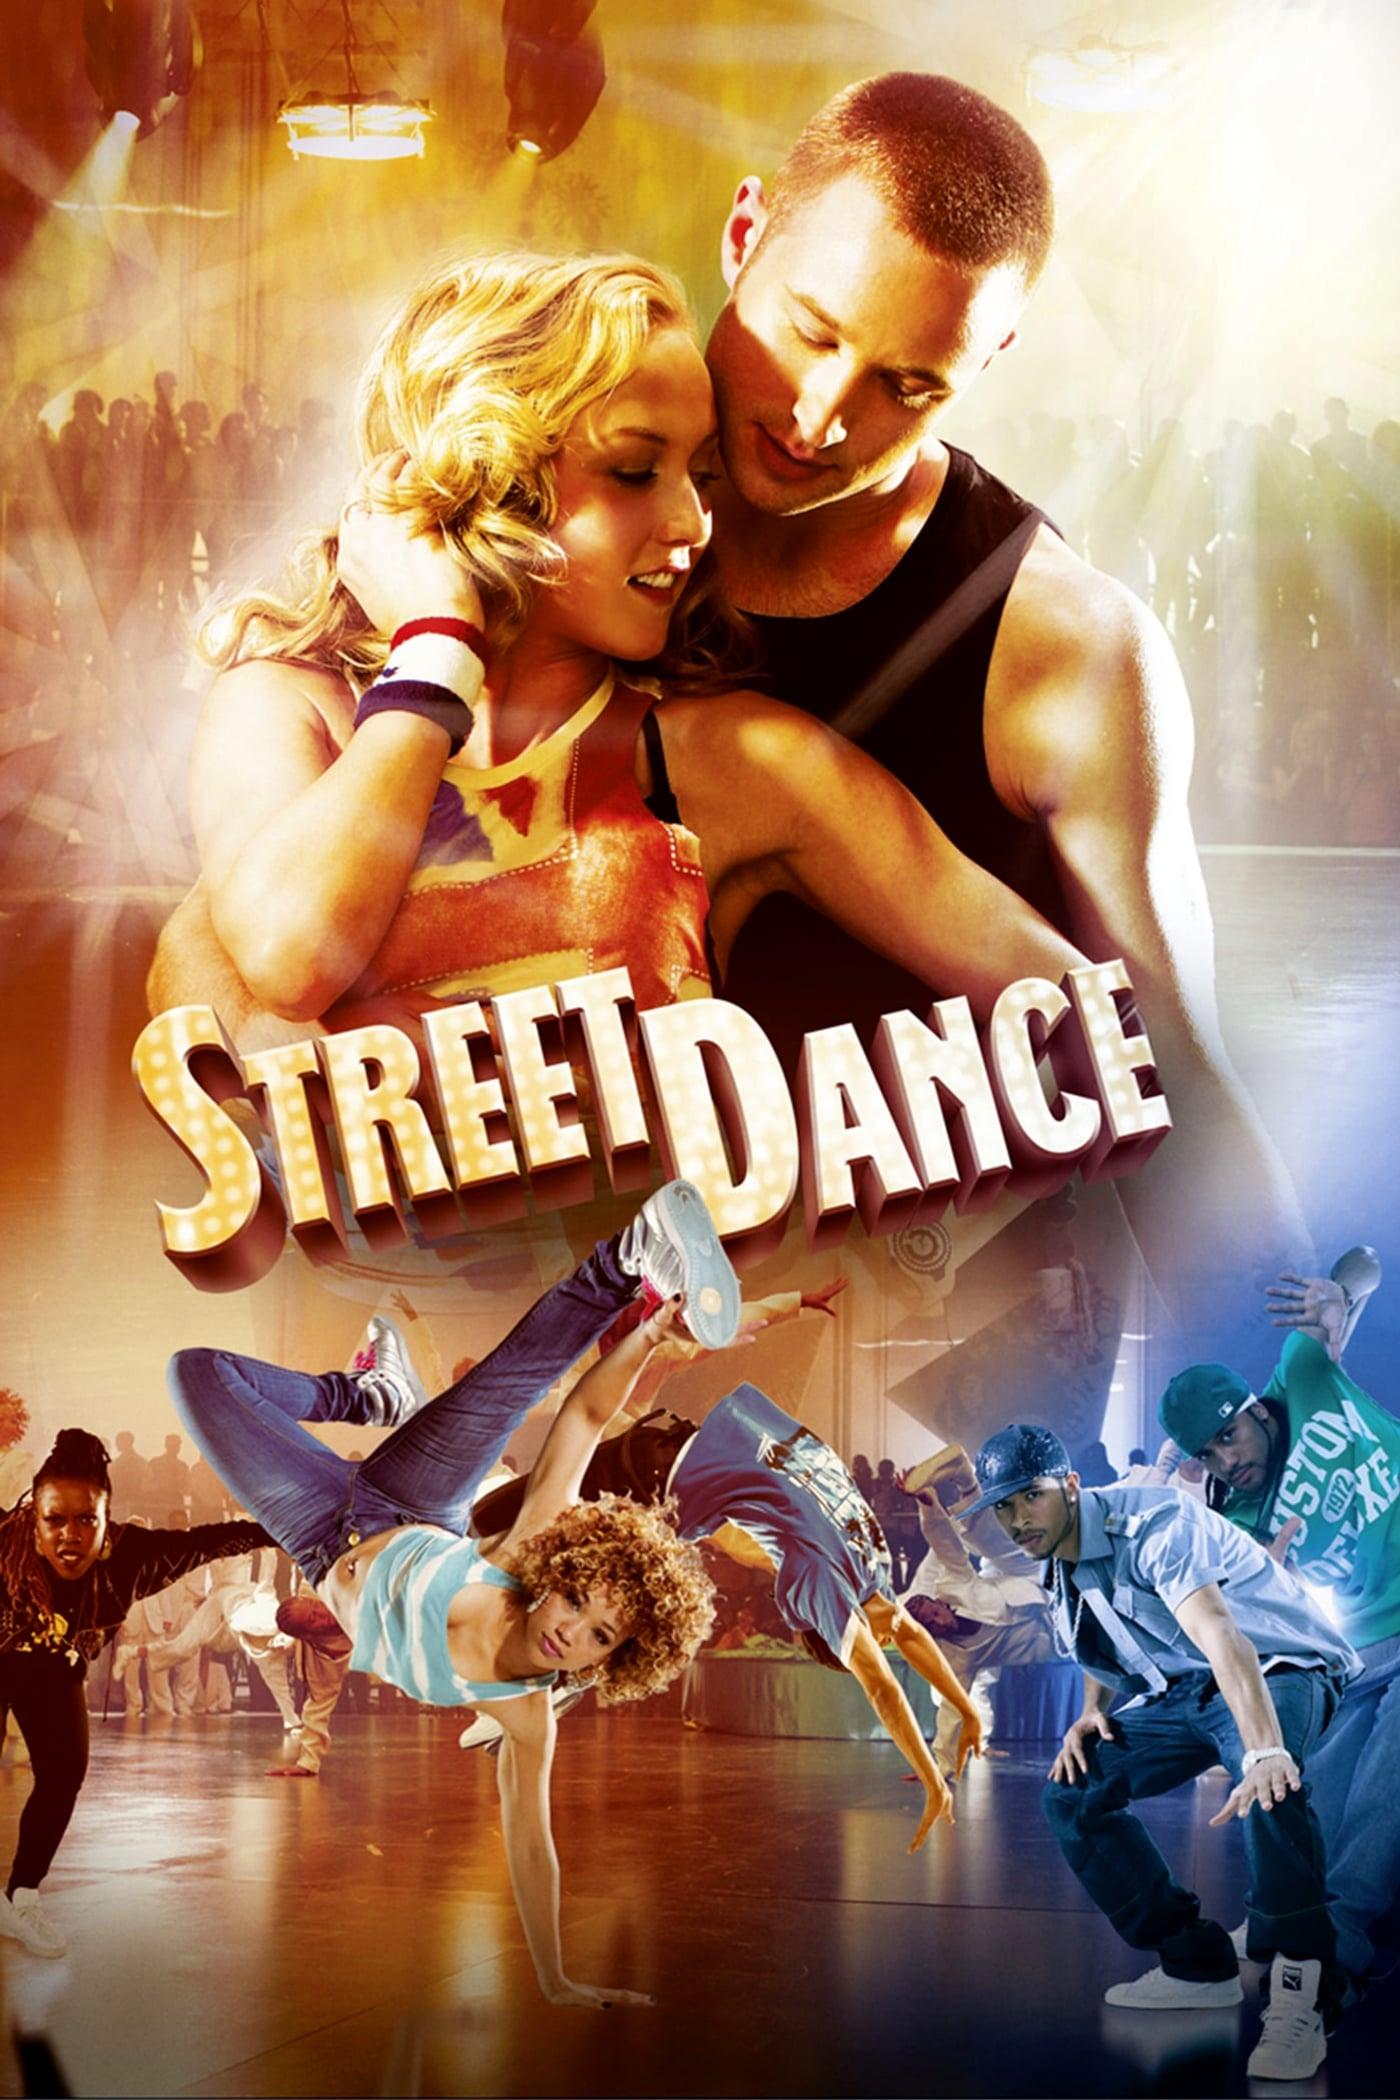 Street Dance ¡A bailar!